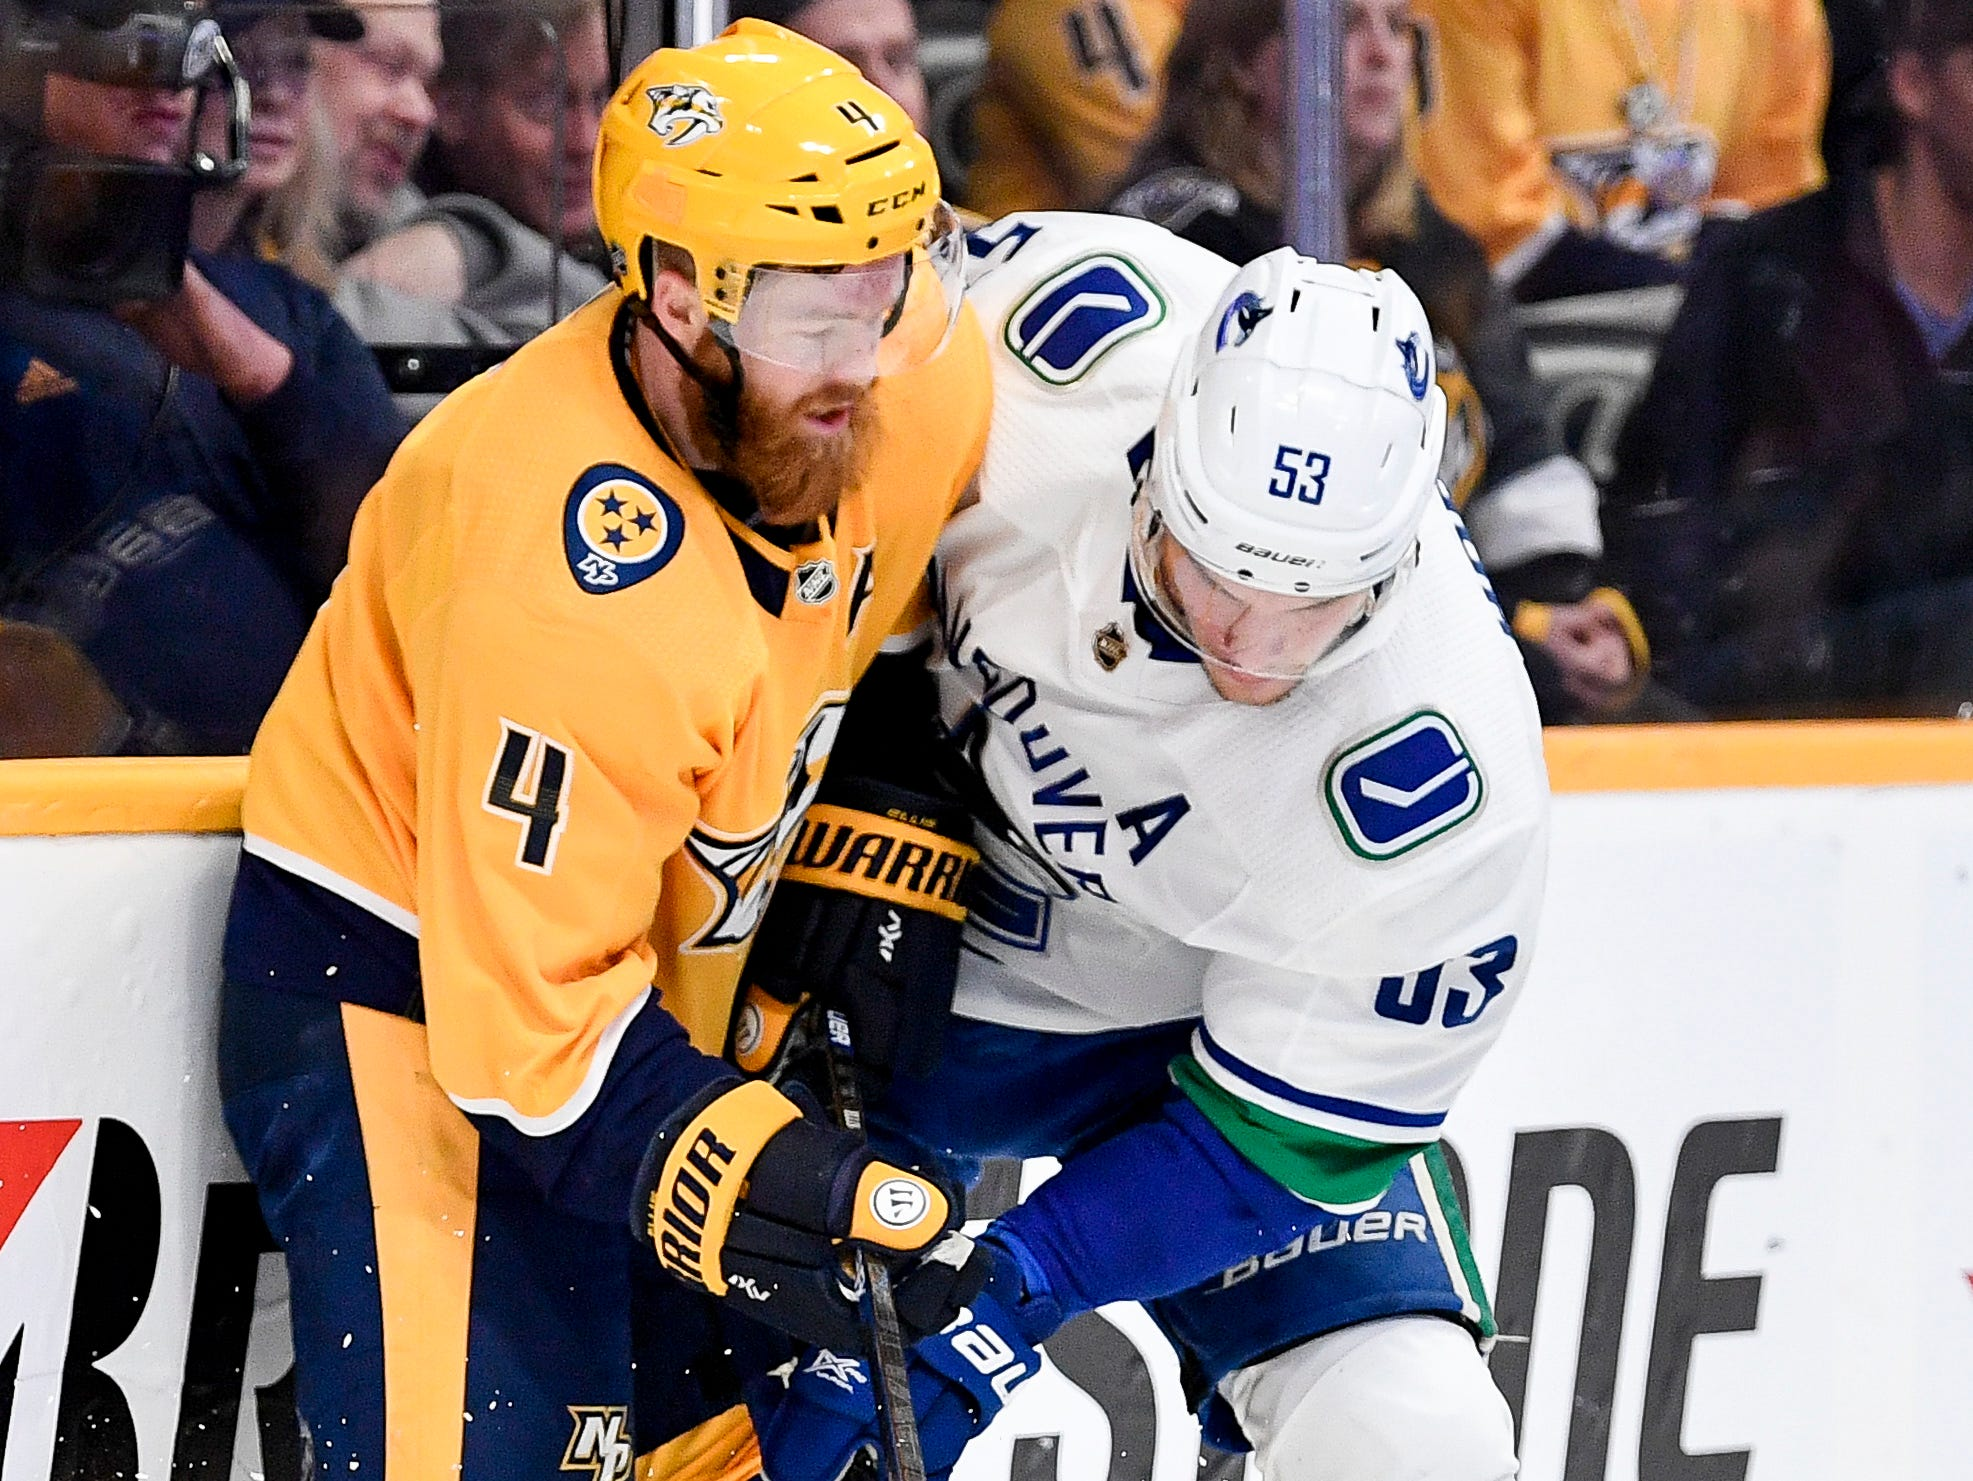 Nashville Predators defenseman Ryan Ellis (4) fights for the puck with Vancouver Canucks center Bo Horvat (53) during the first period at Bridgestone Arena in Nashville, Tenn., Thursday, Dec. 13, 2018.